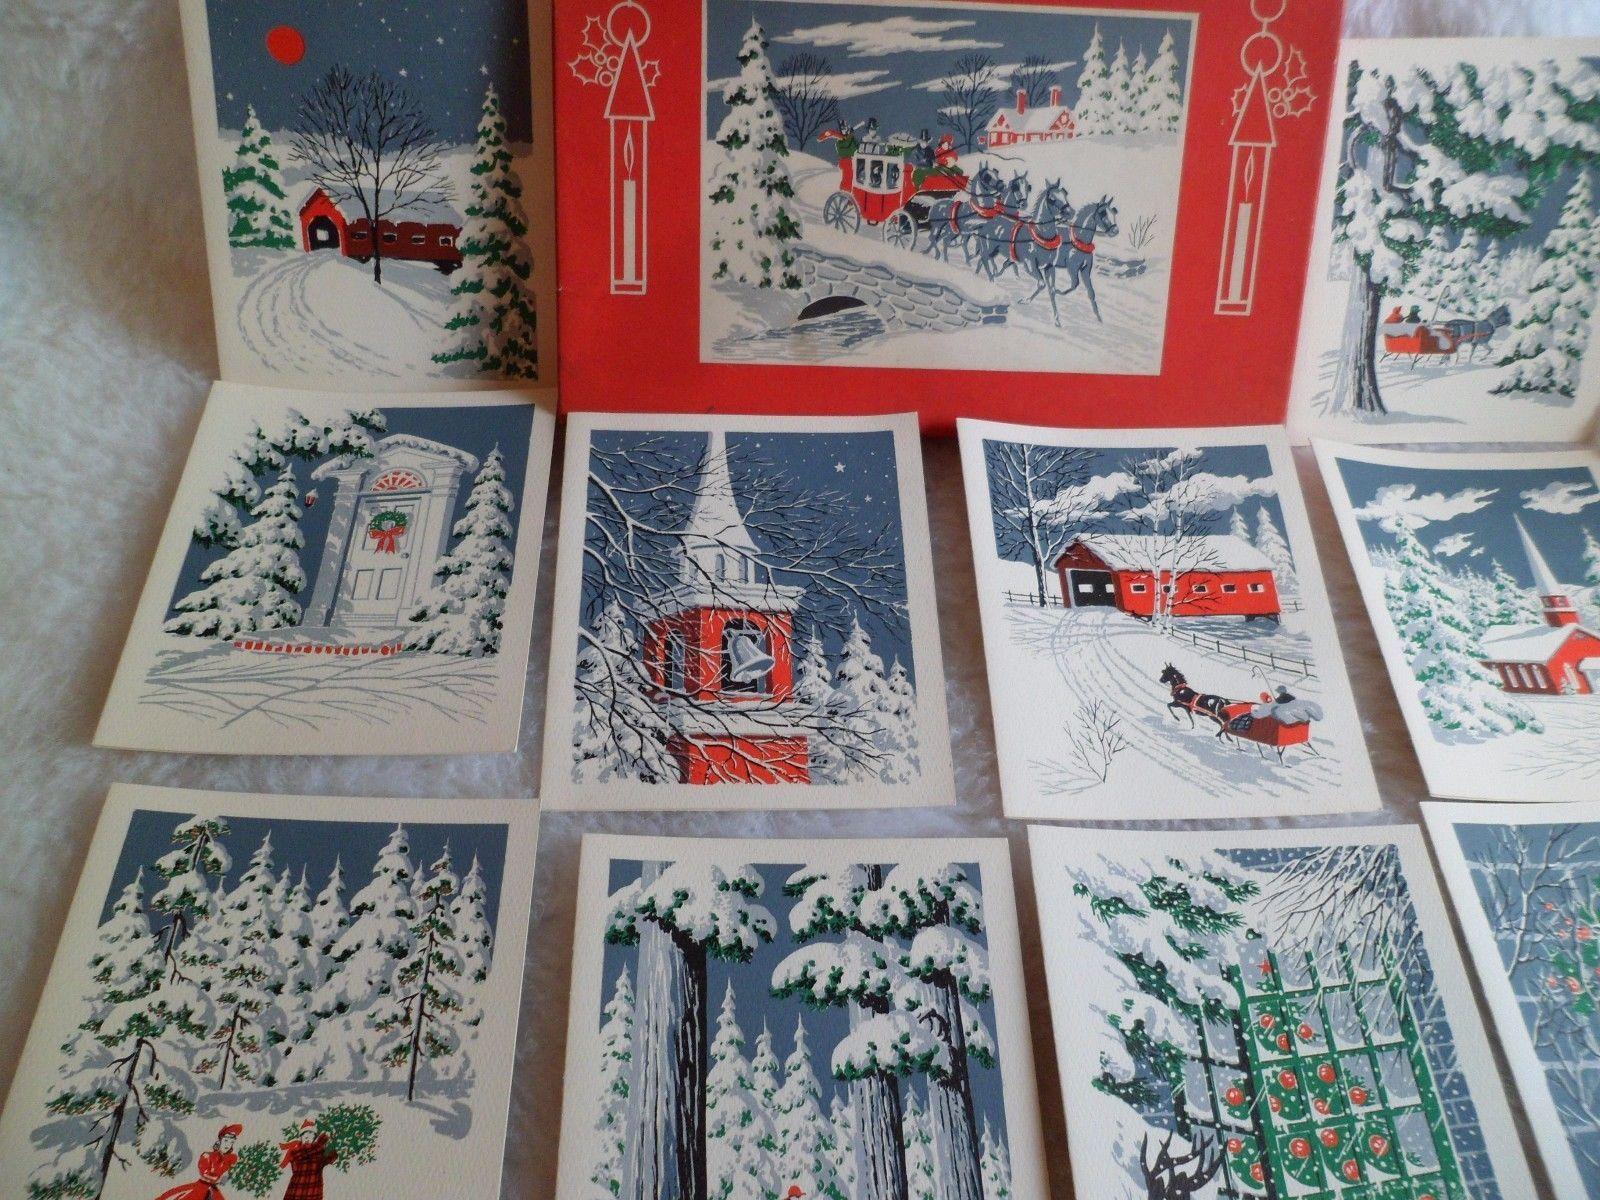 Vtg Christmas Greeting Cards Box 18 Silk Screen Different Designs Sunshine Card | eBay